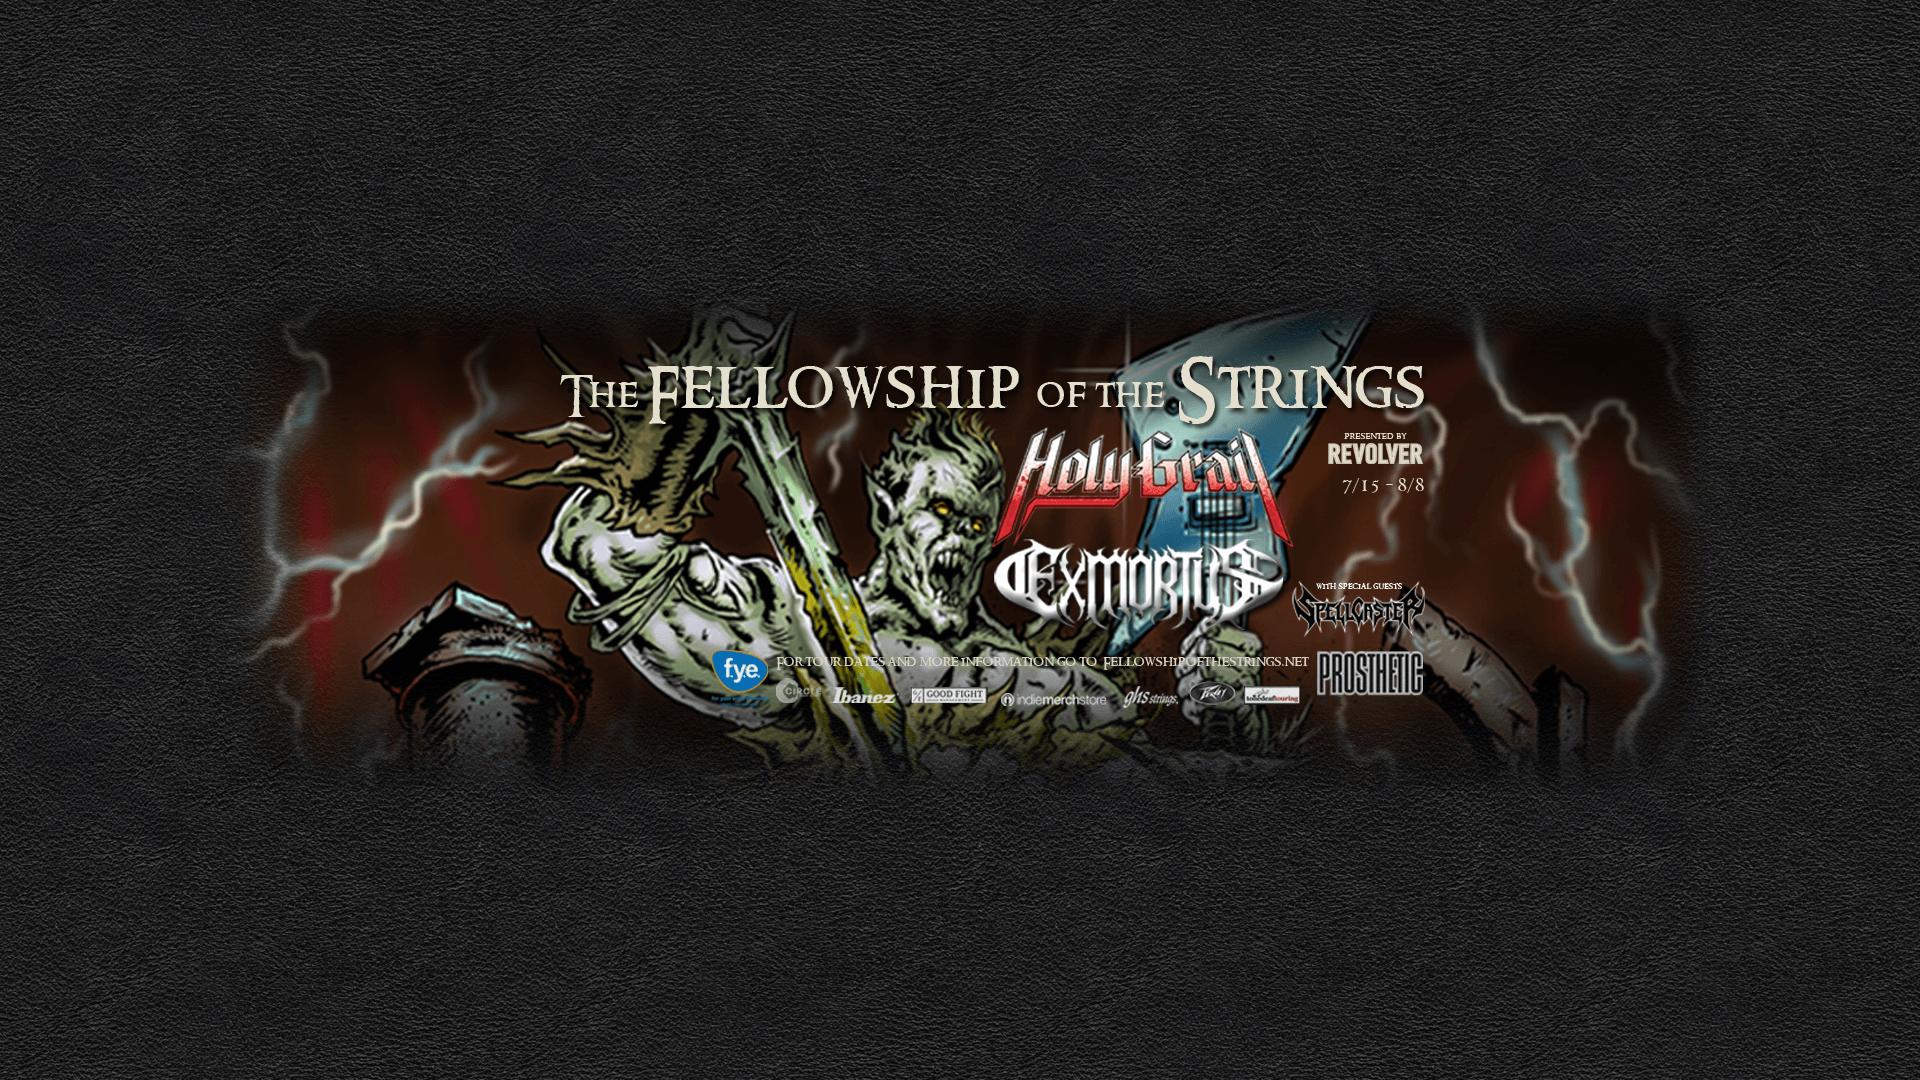 Fellowship of the Strings Tour